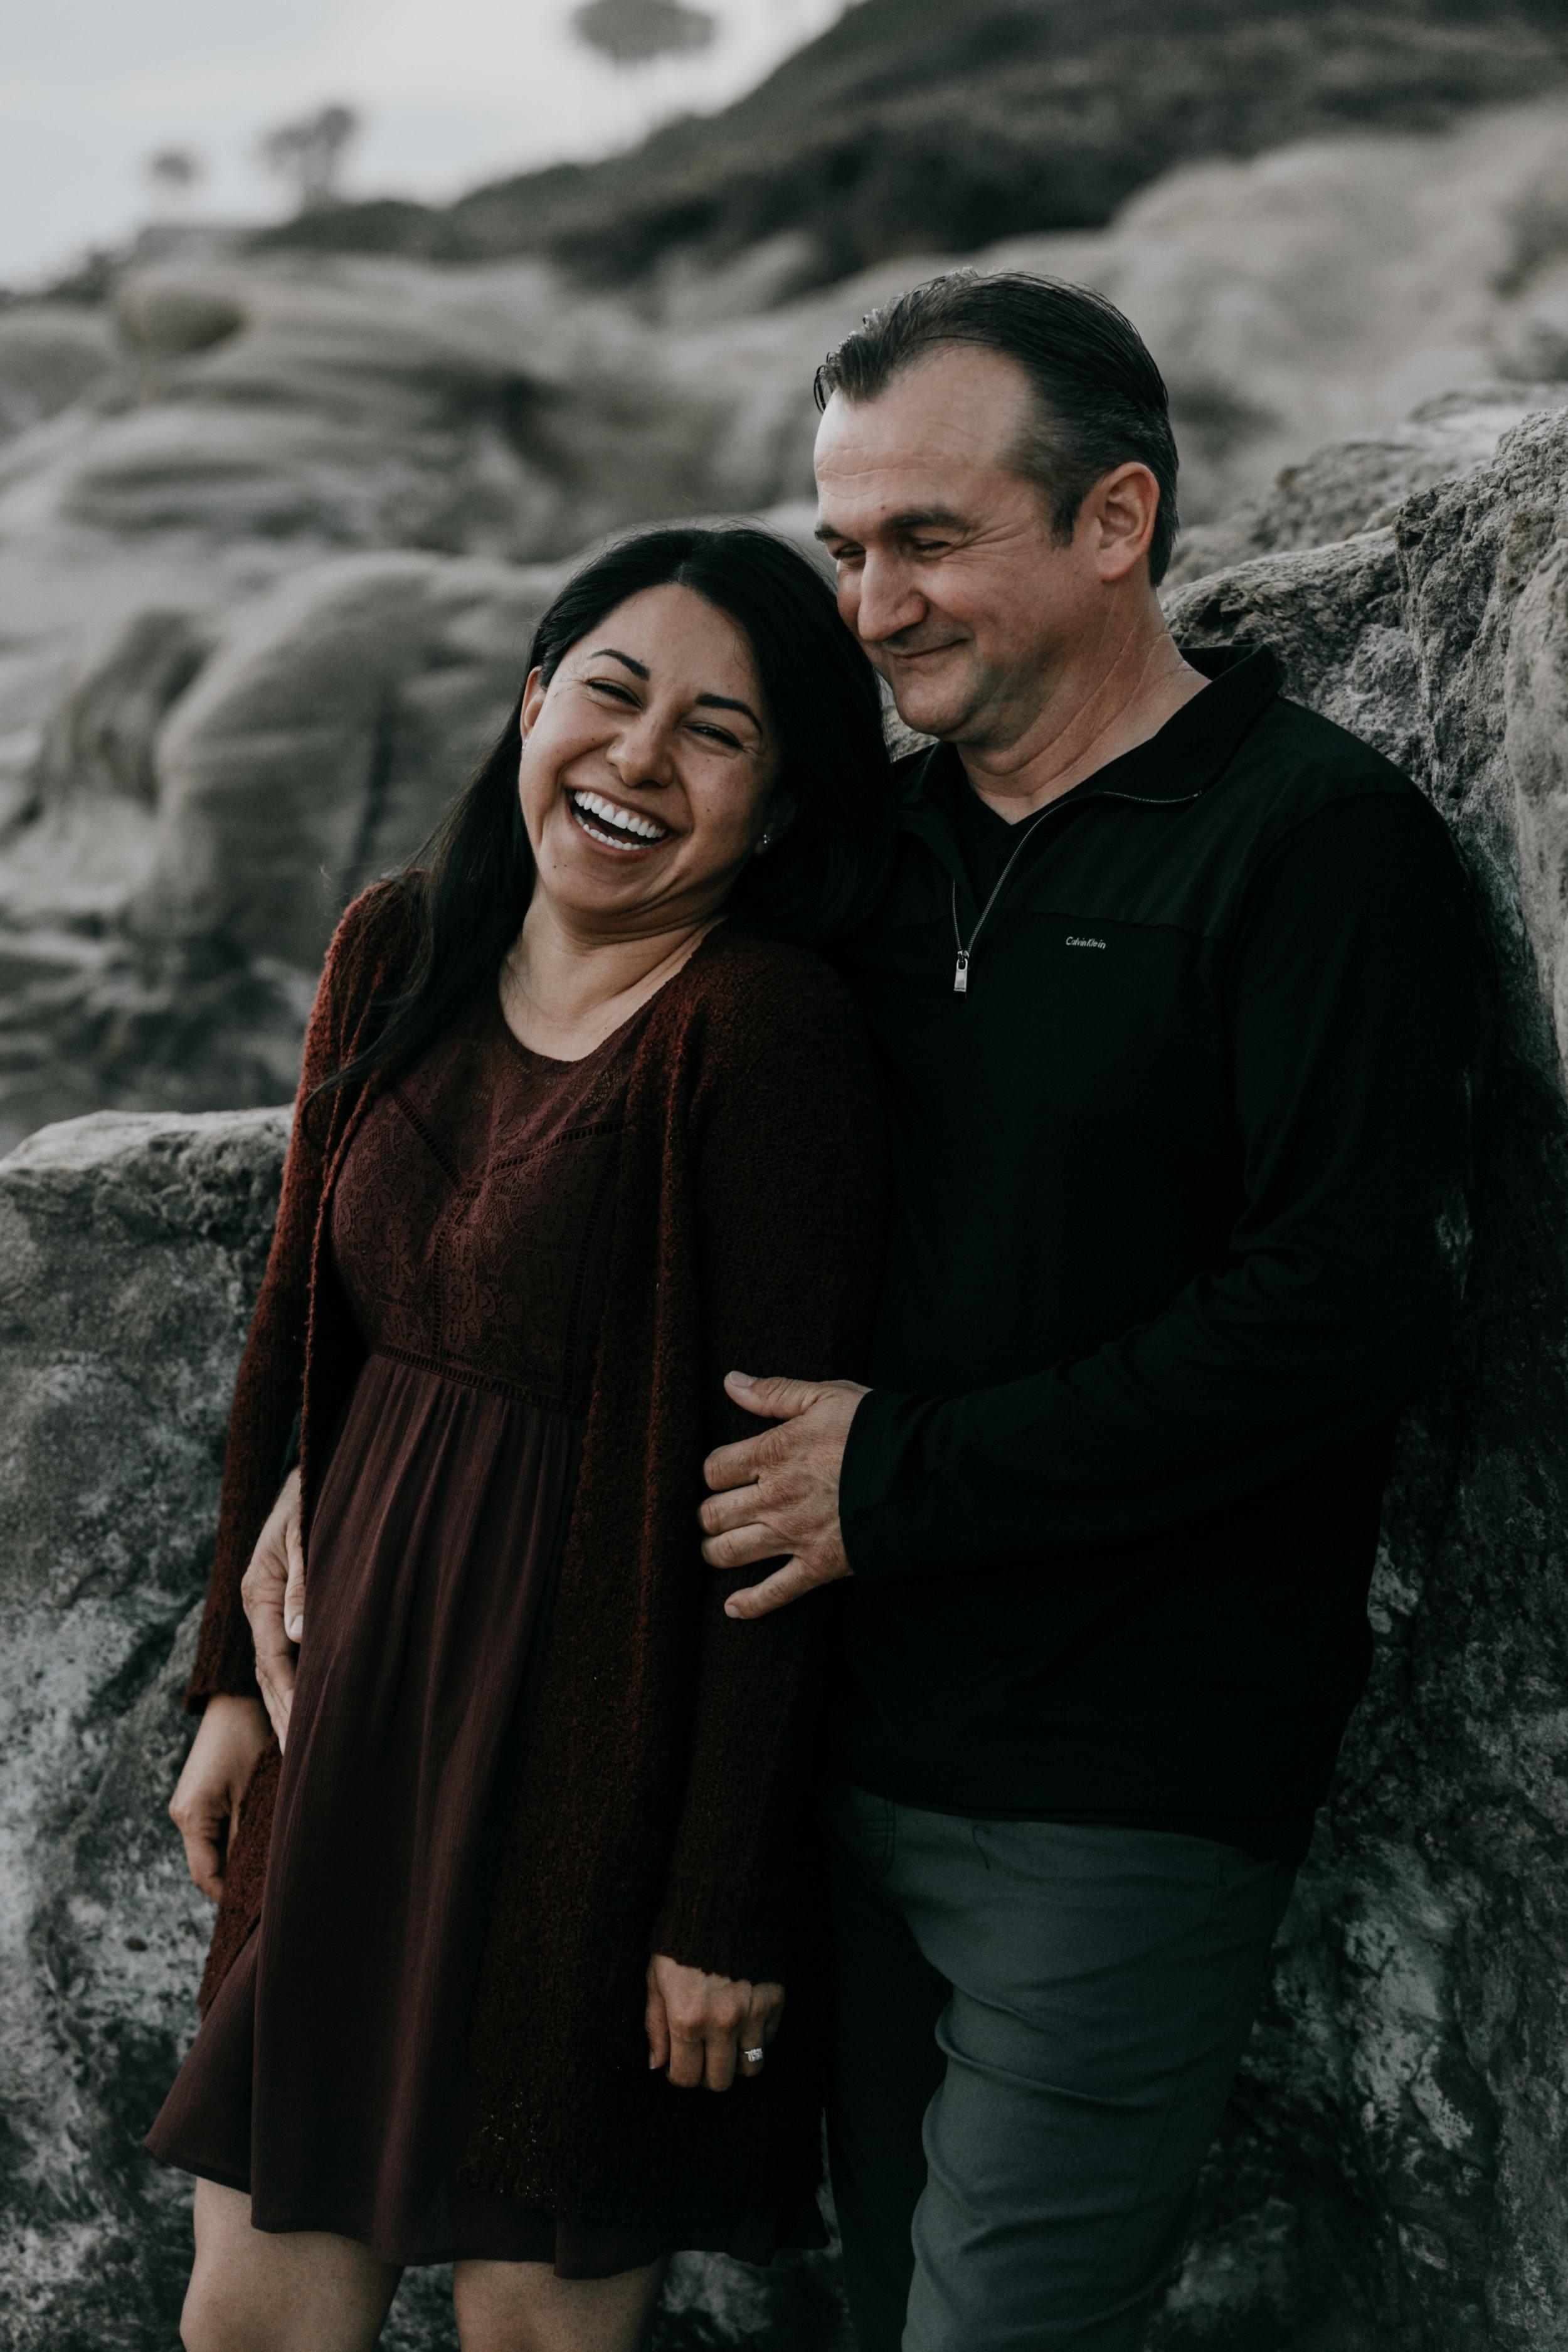 Astray Photography - San Diego wedding photography